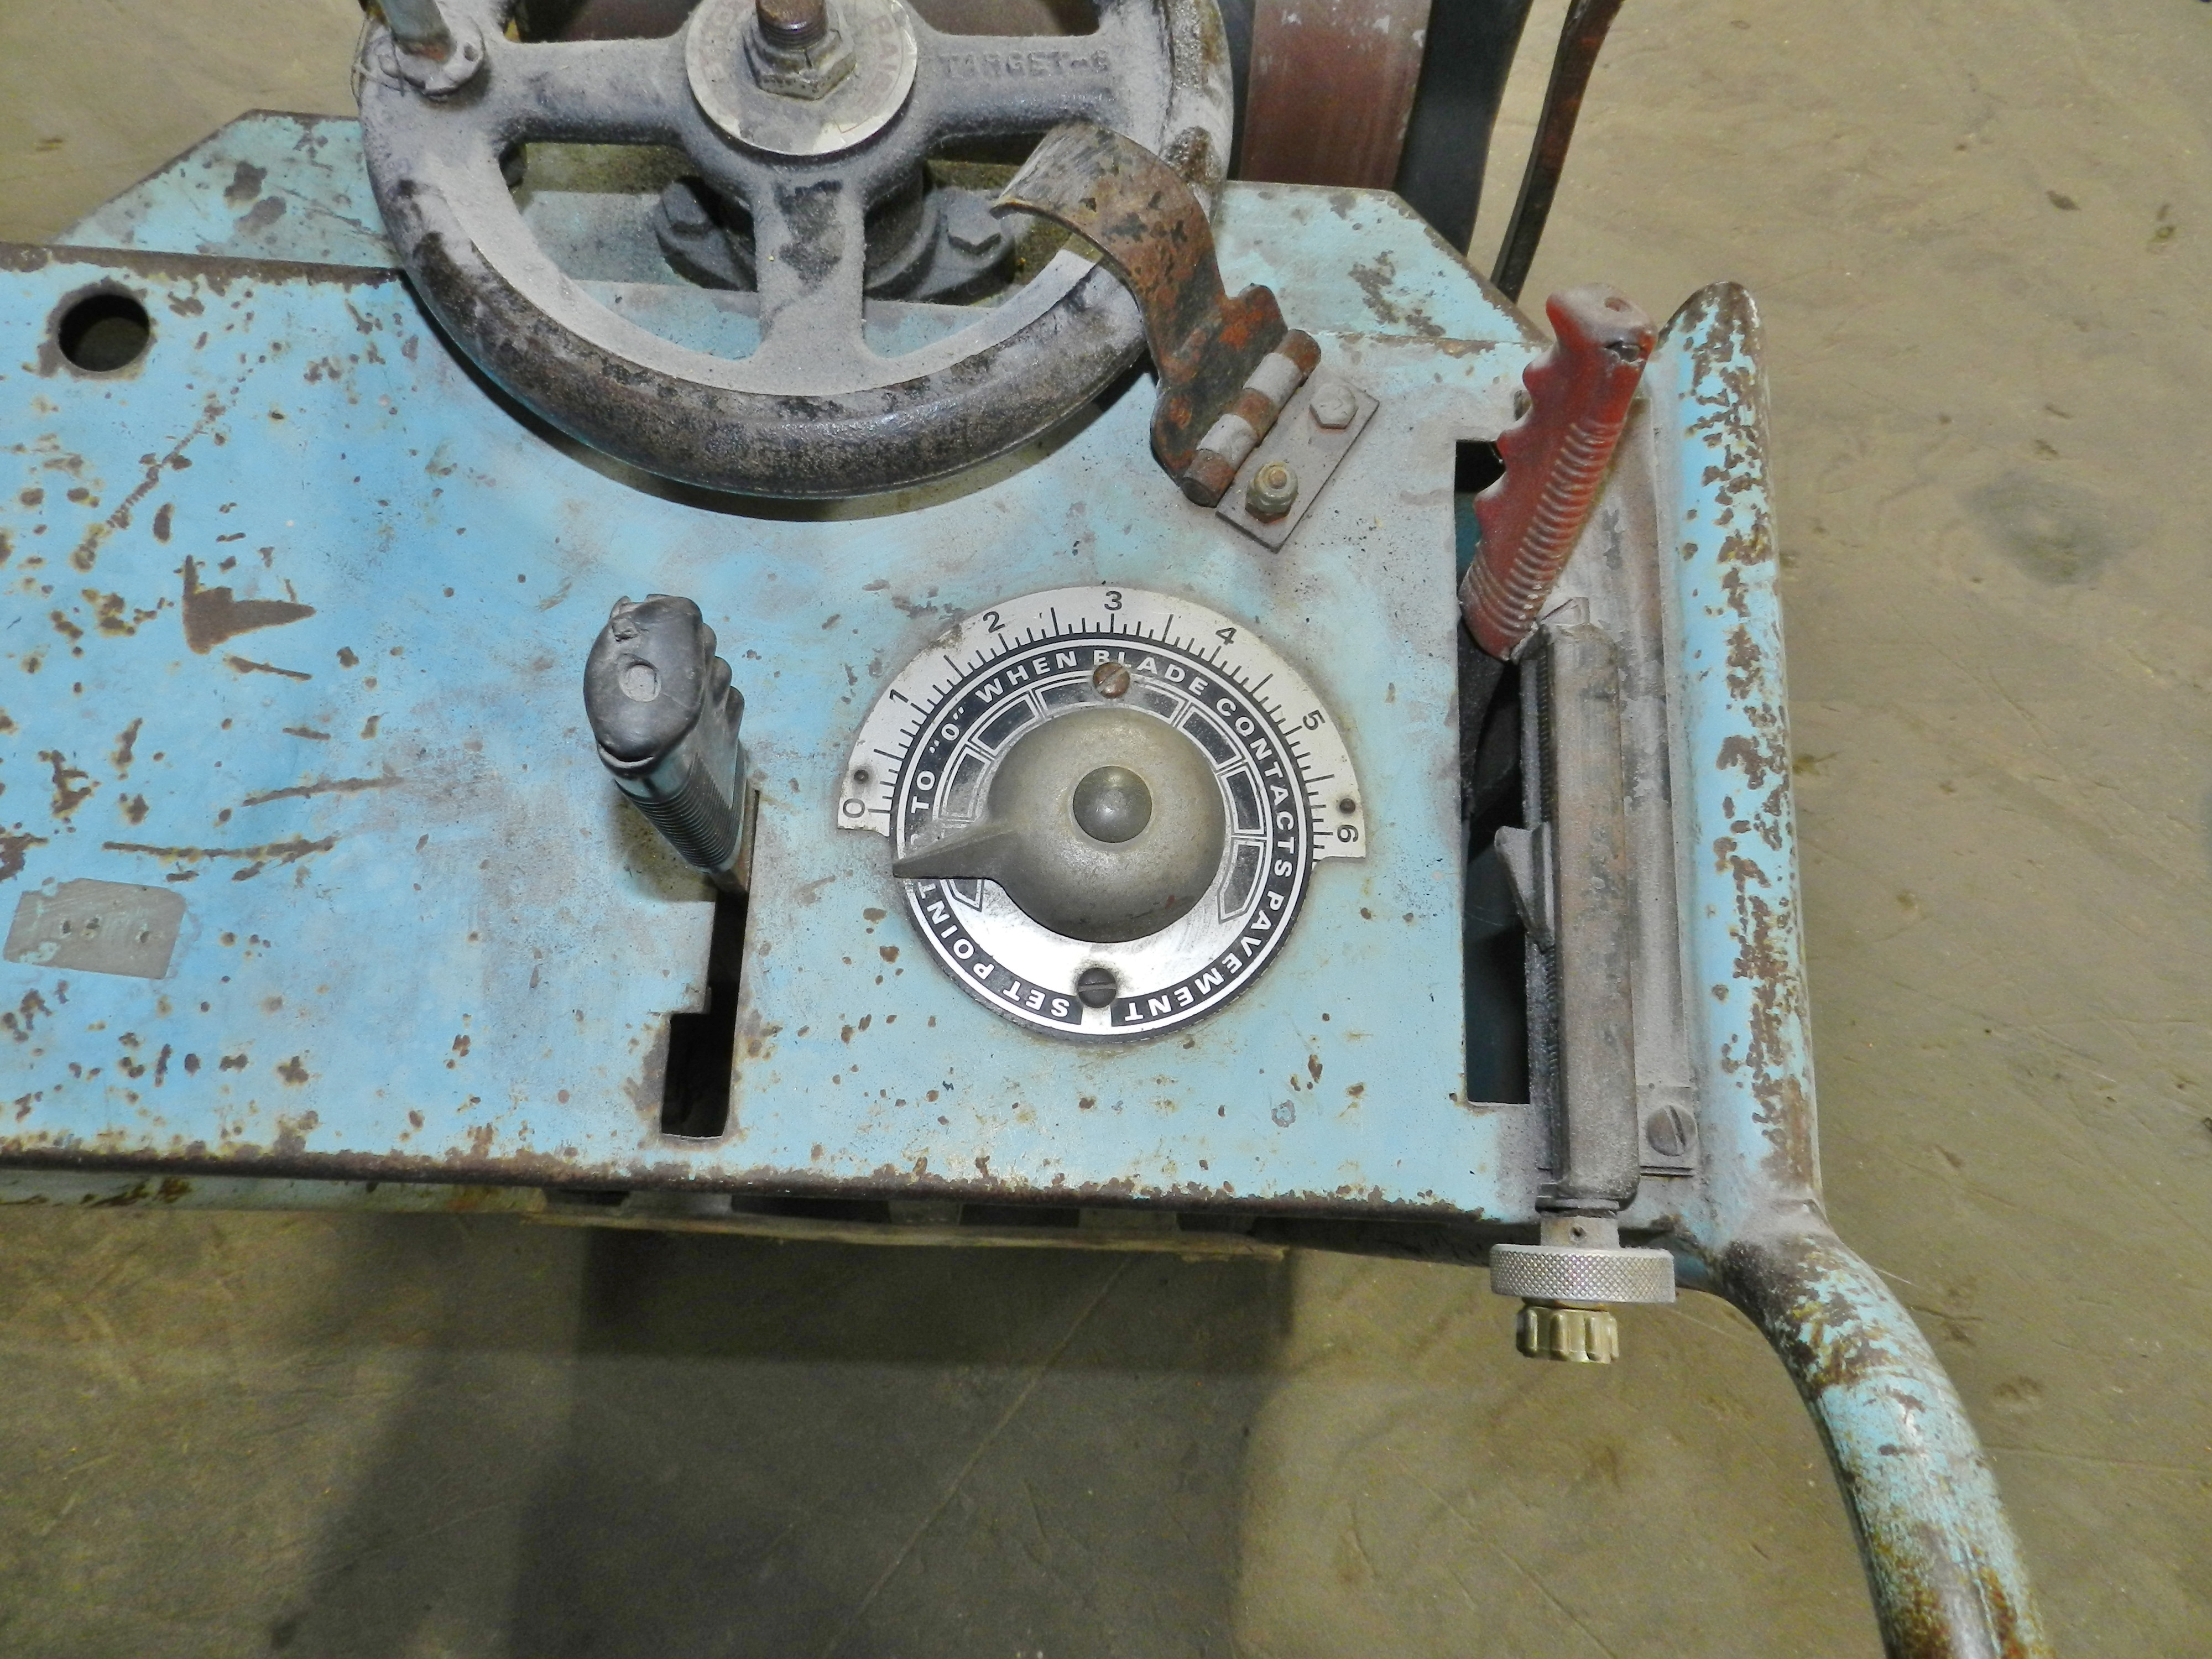 Lot 61 - Target EC185 Concrete Saw